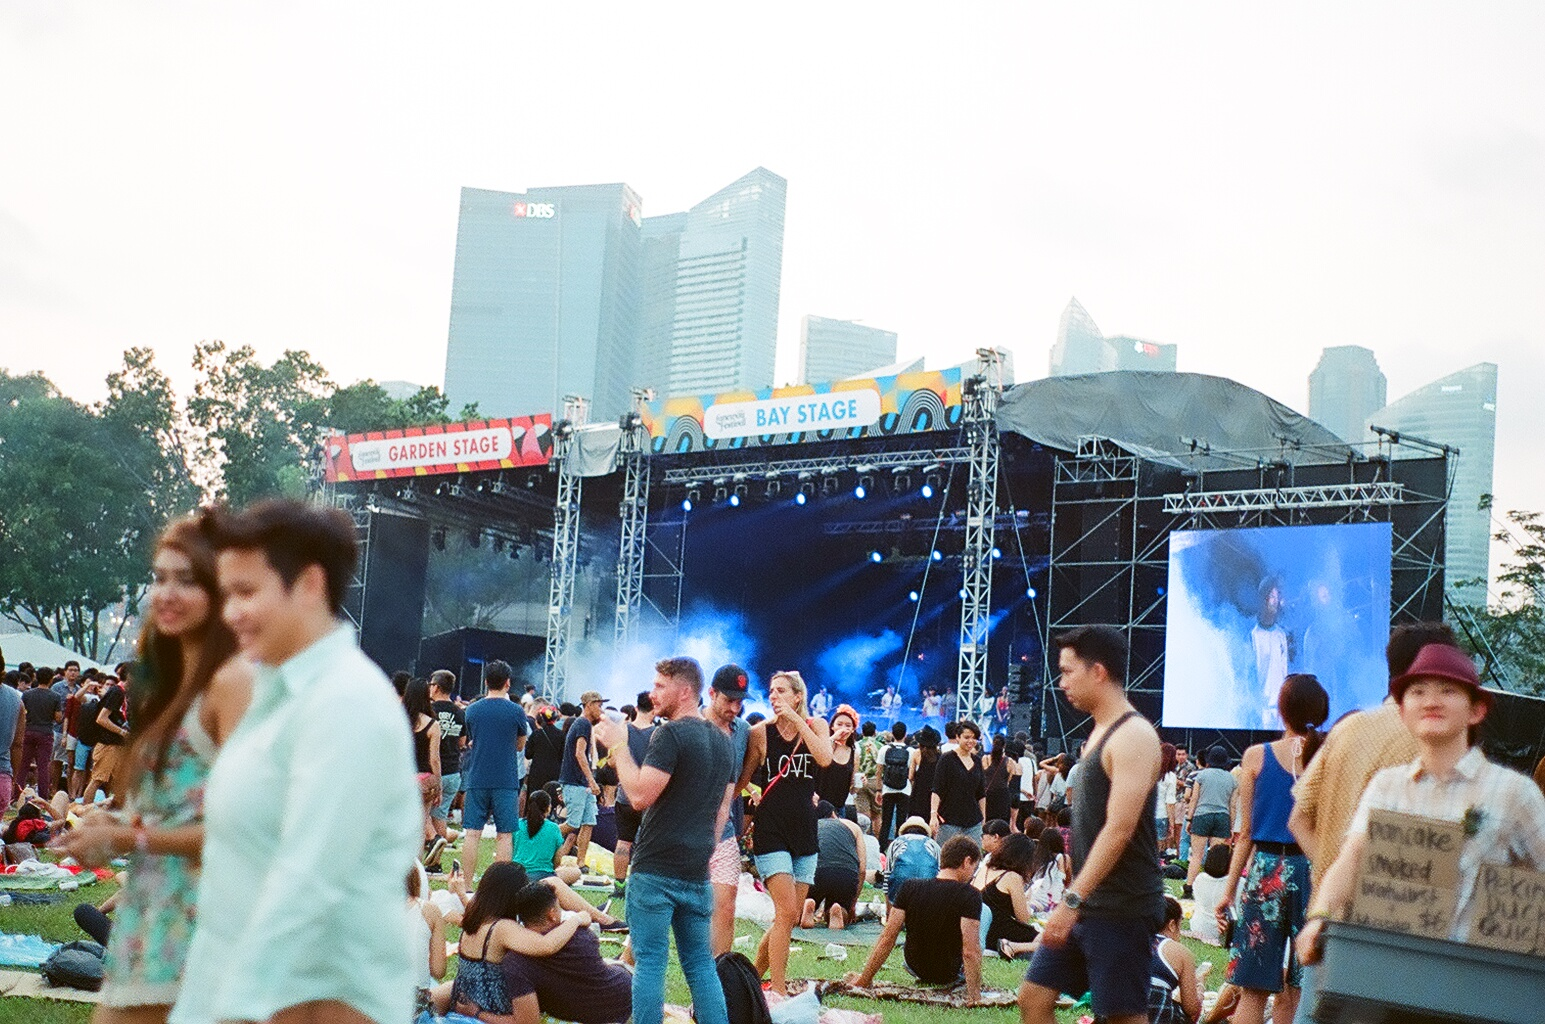 St. Jerome's Laneway Festival, Singapore